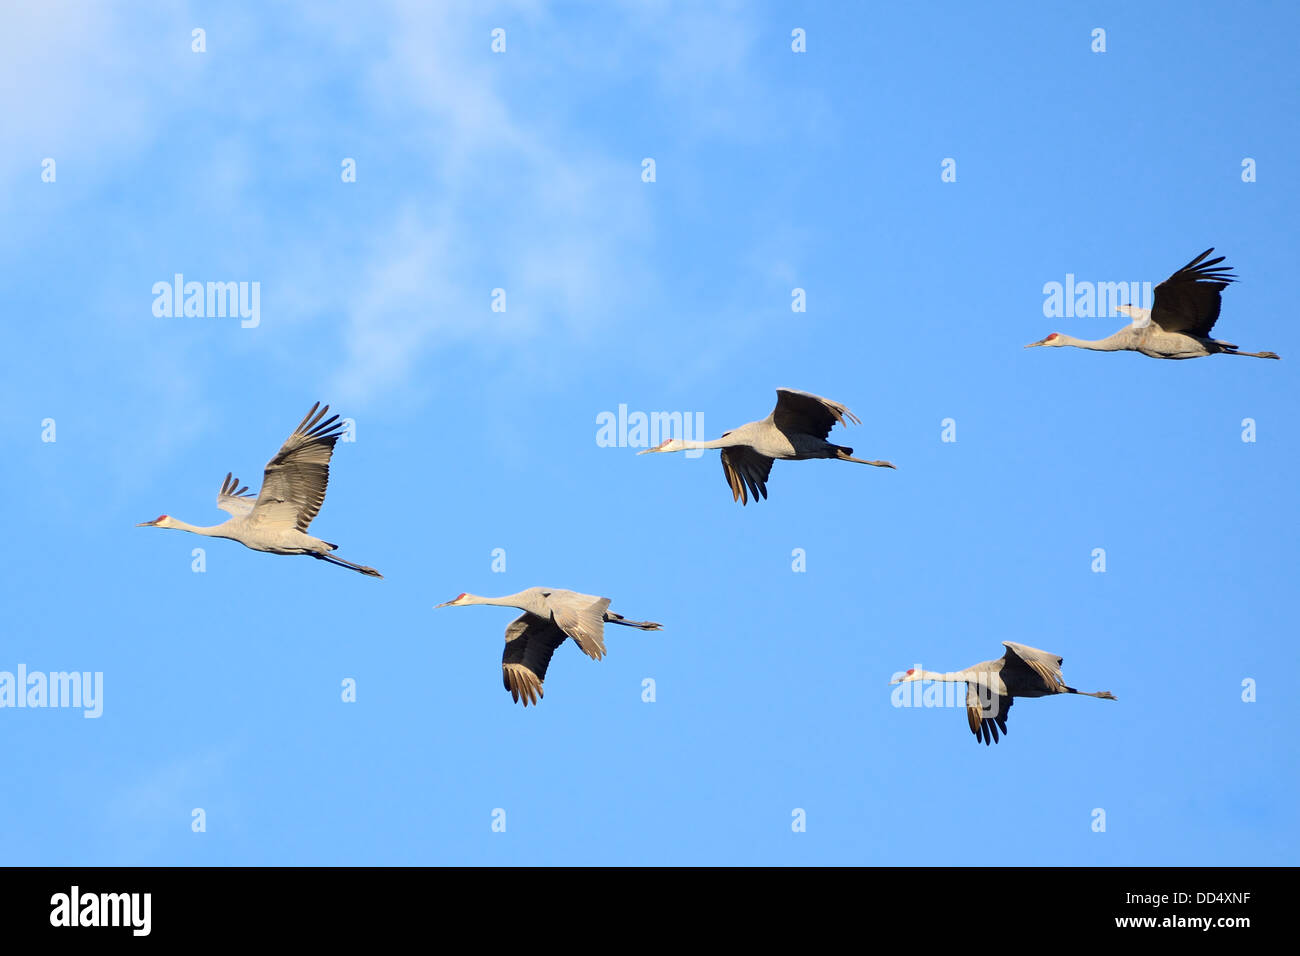 Sandhill Cranes (Grus canadensis) in Flight - Stock Image